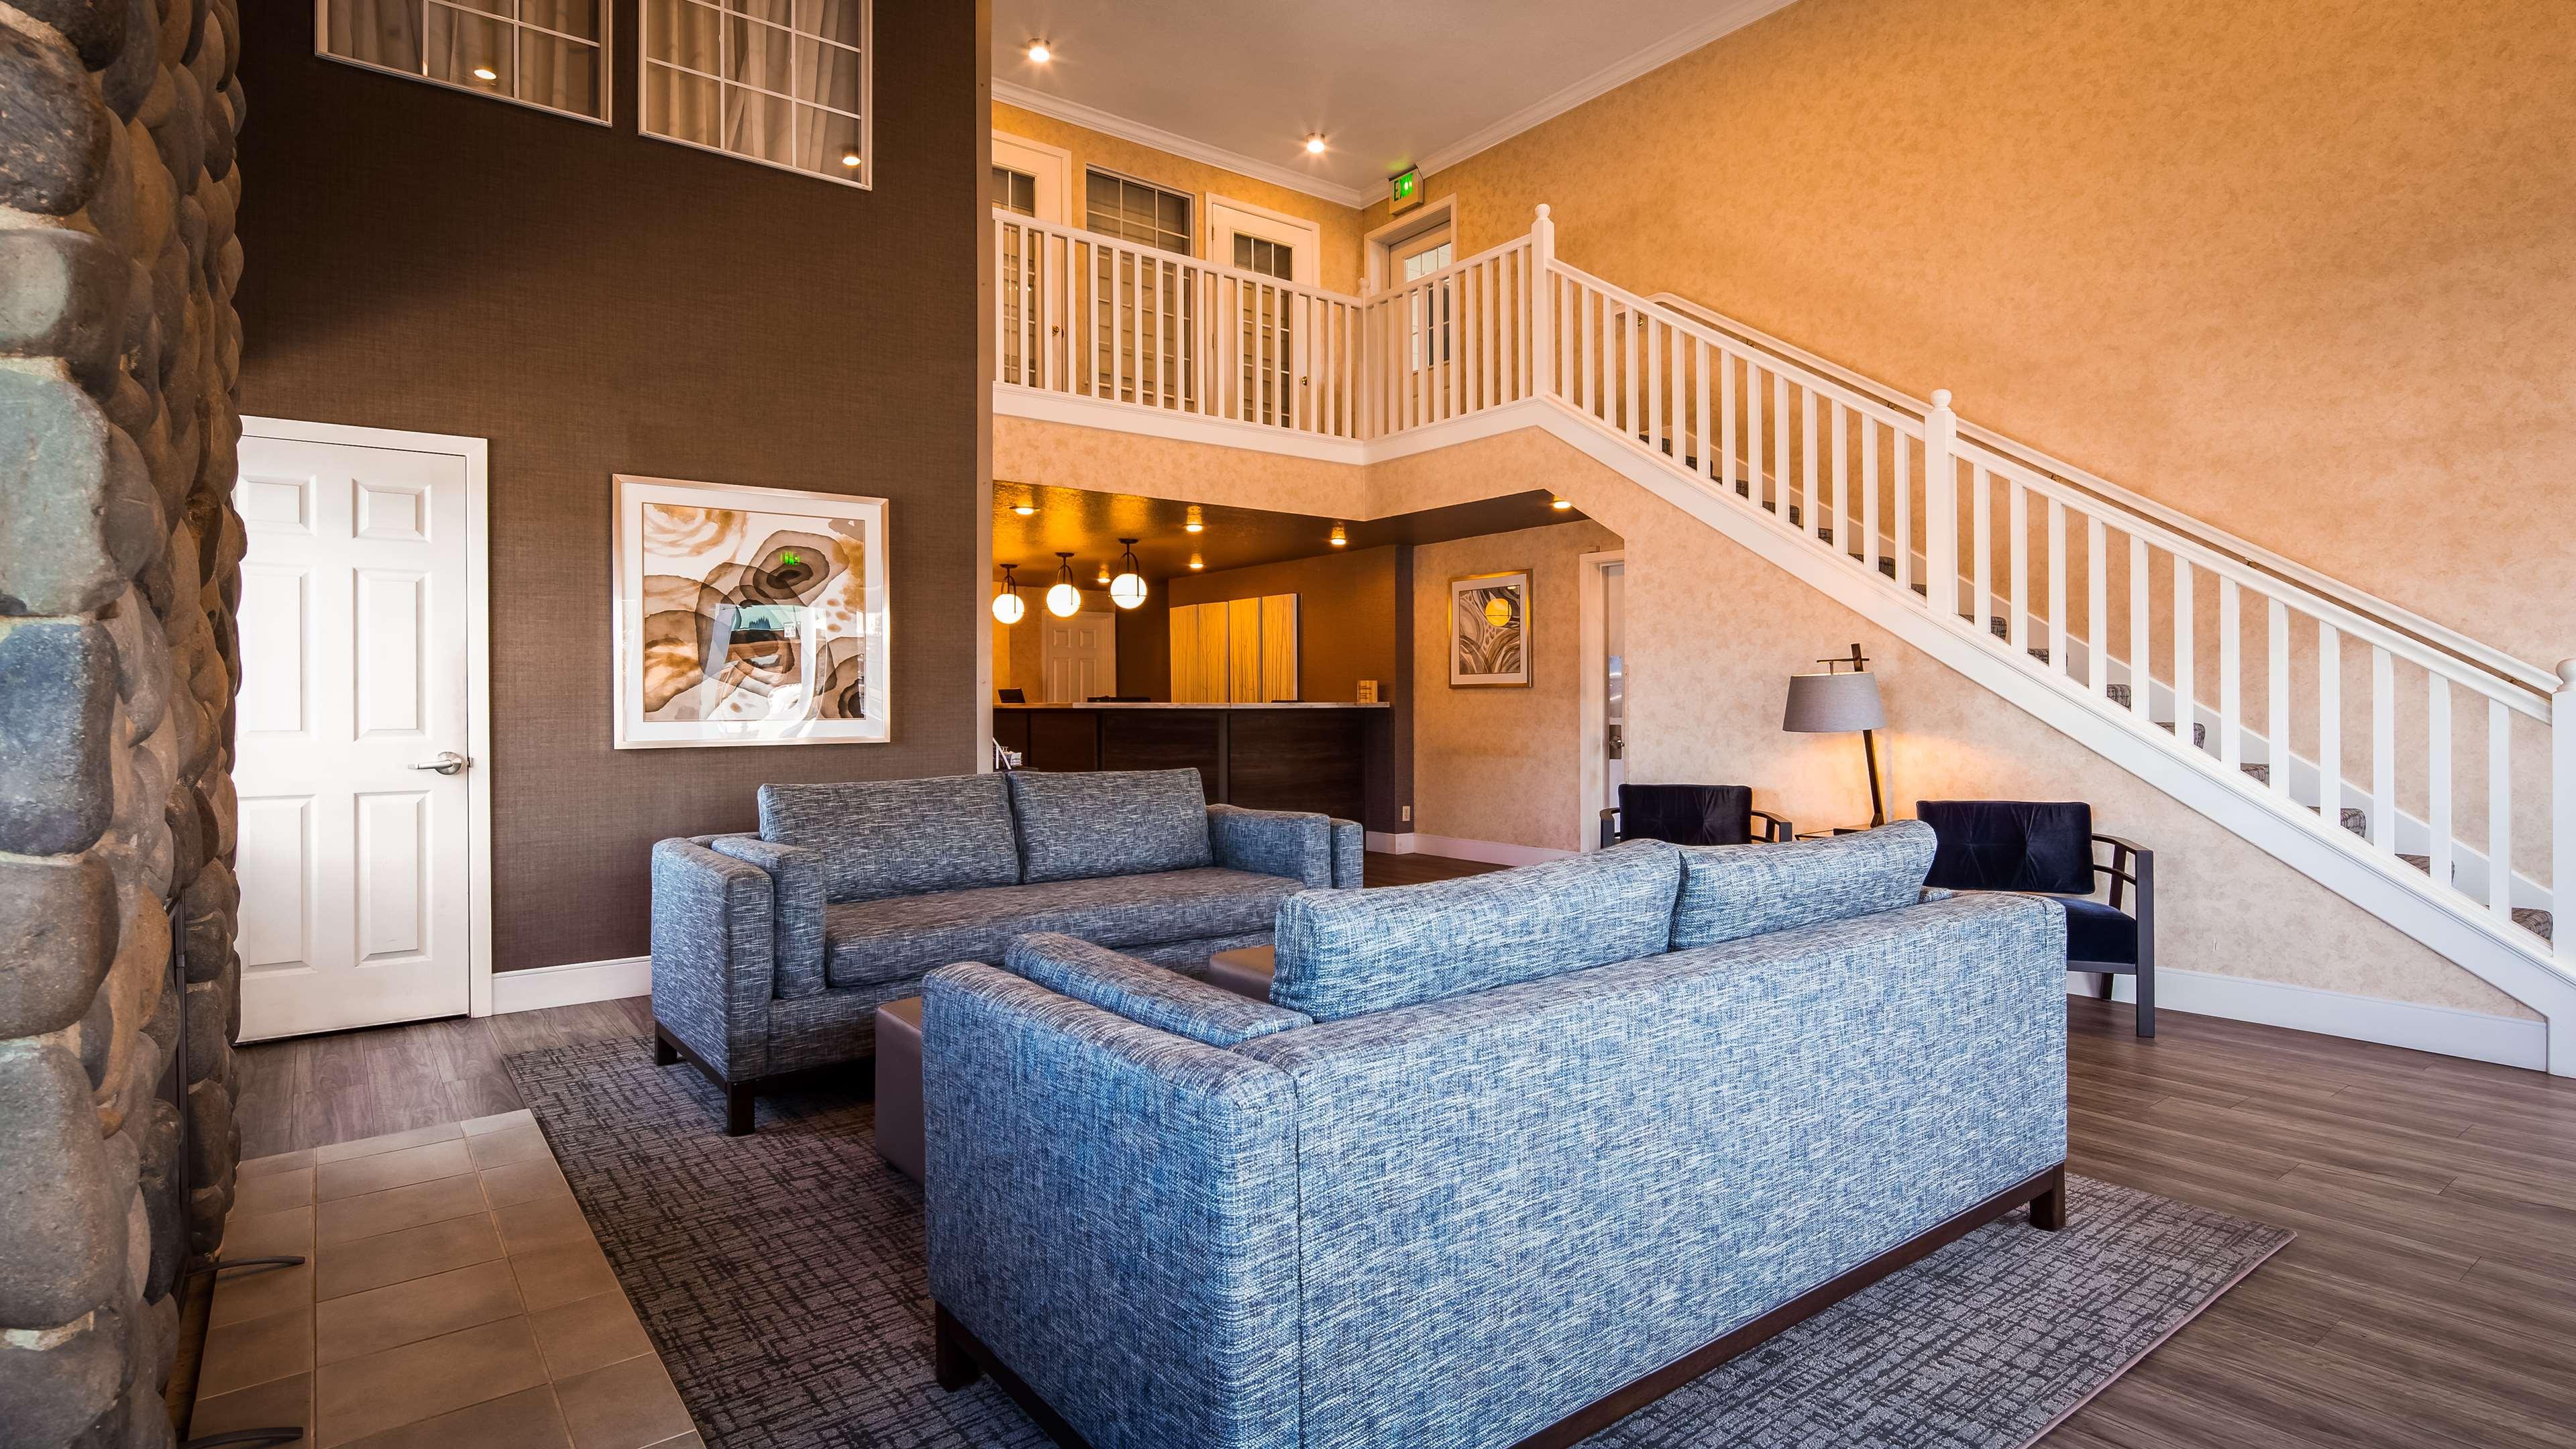 Best Western Horizon Inn image 7